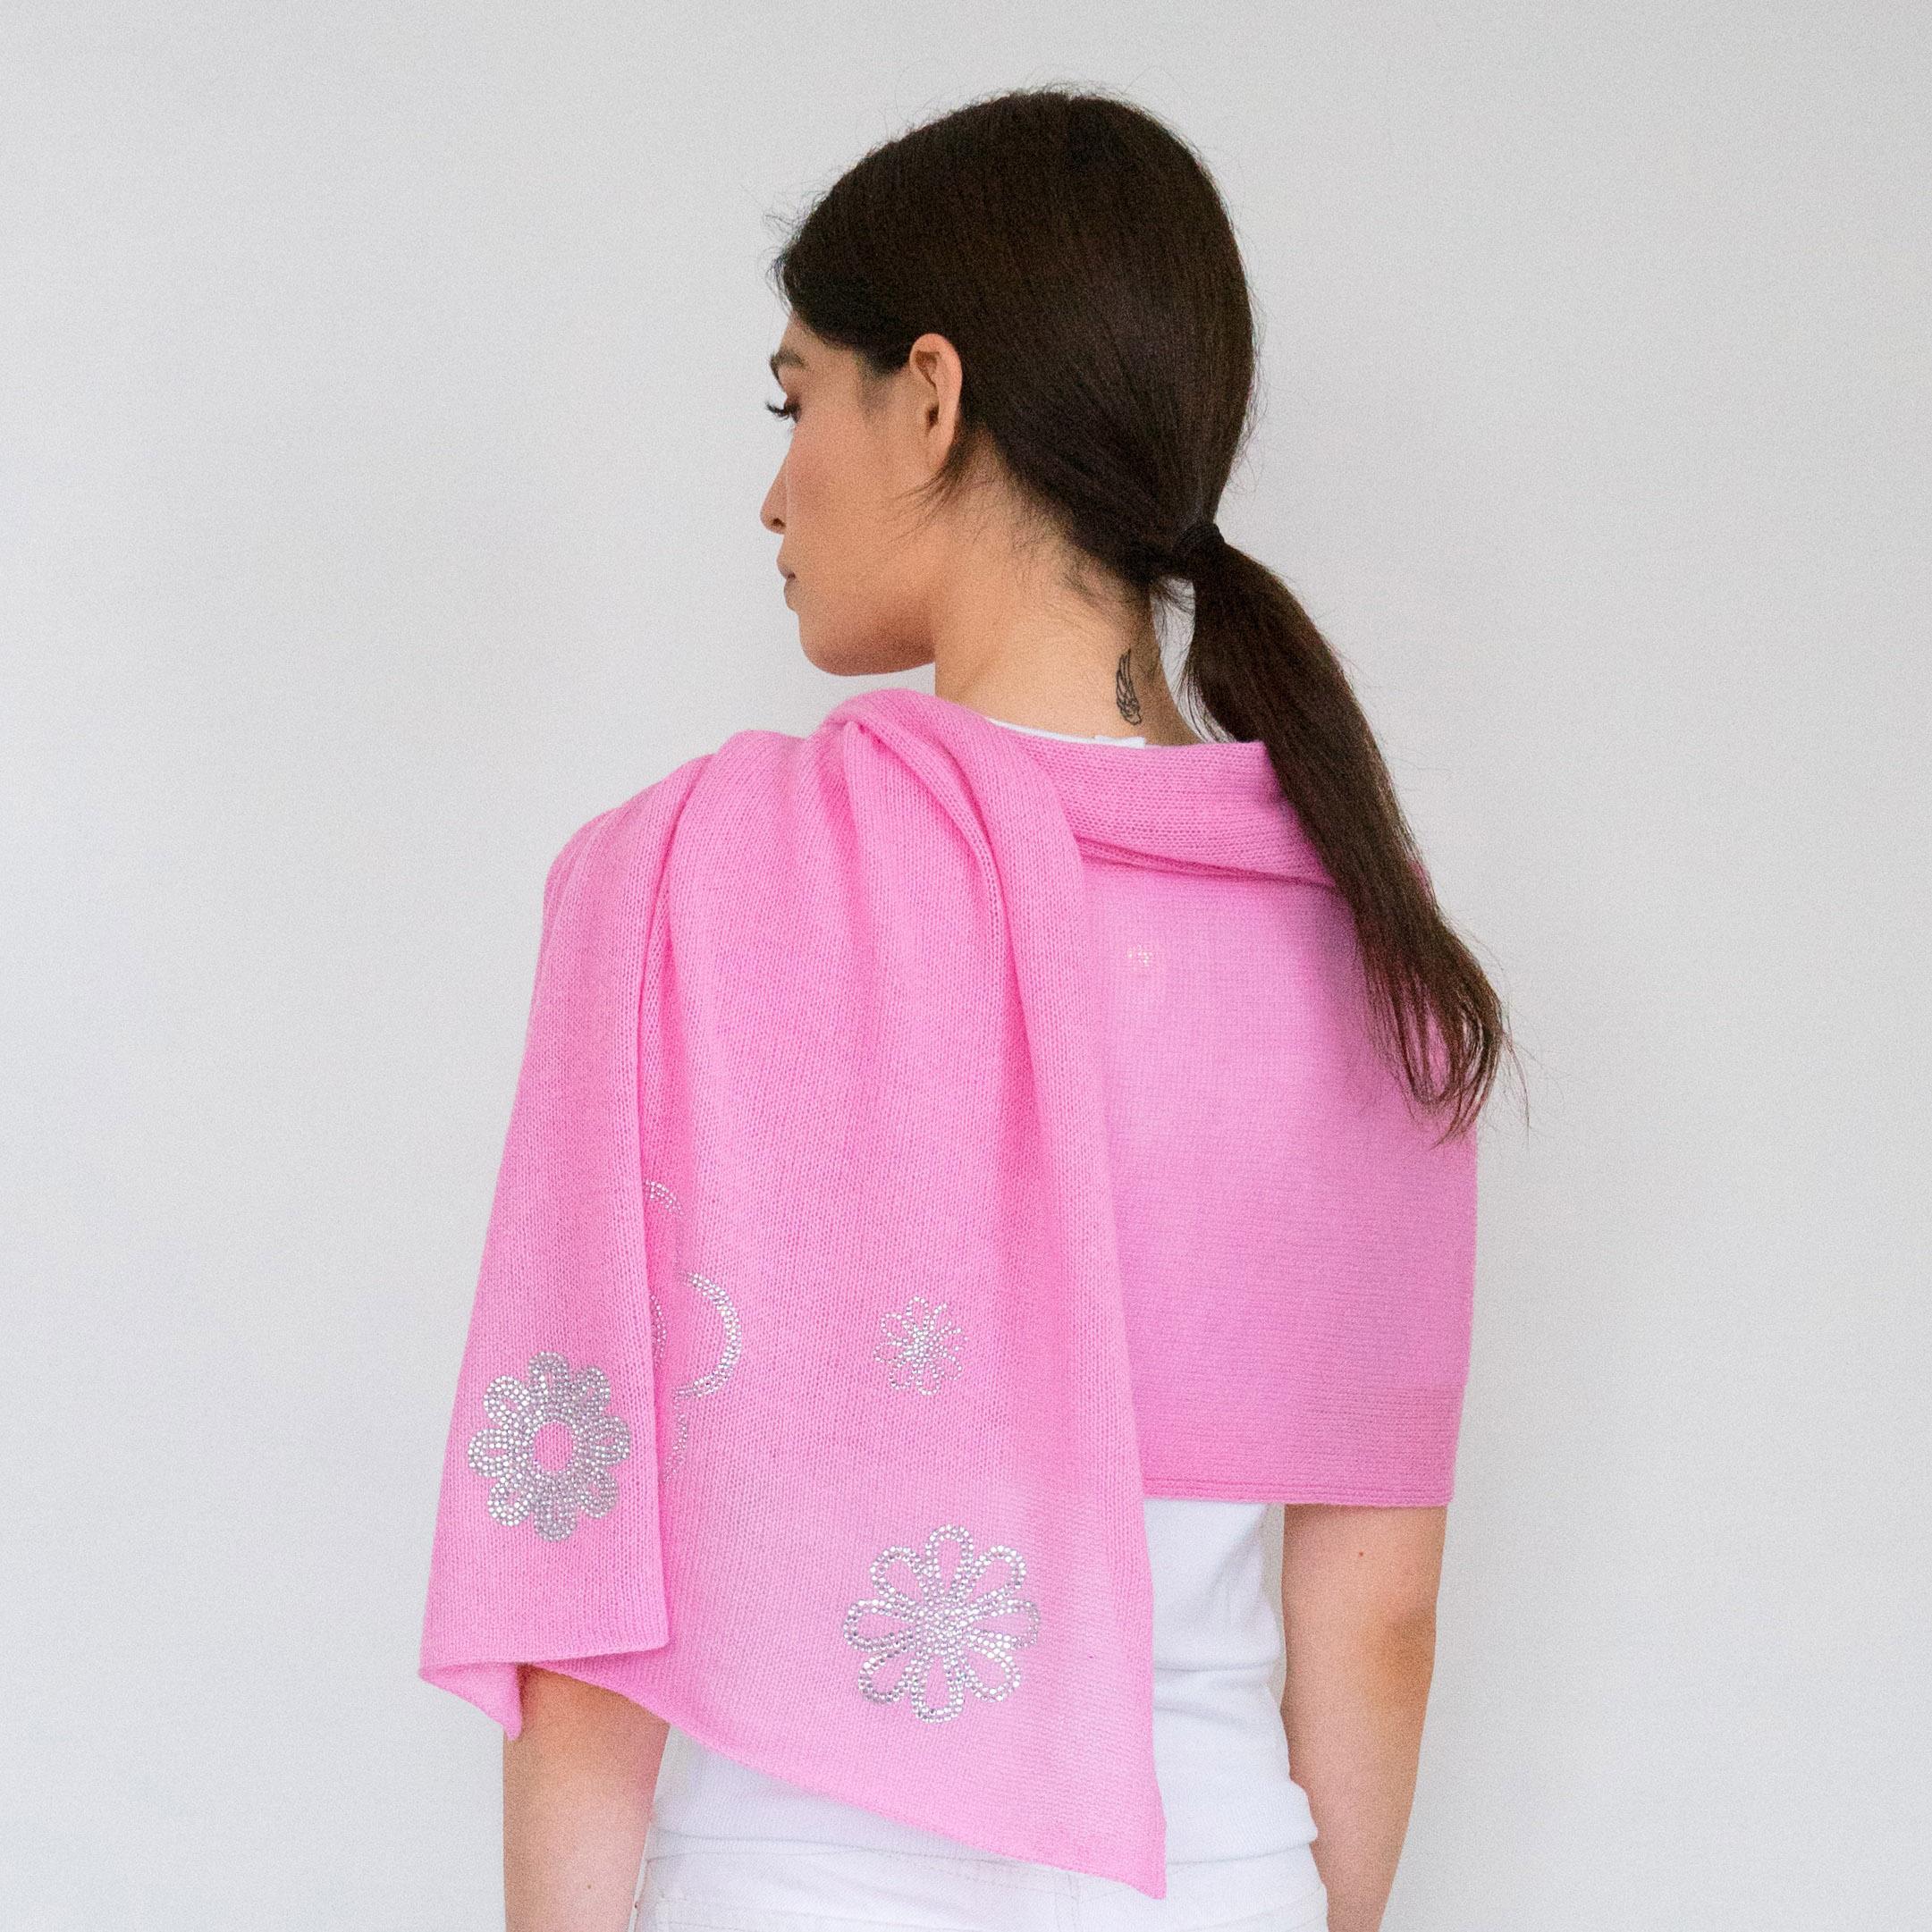 - Scattered Crystal Flowers on Carnation Pink Cashmere